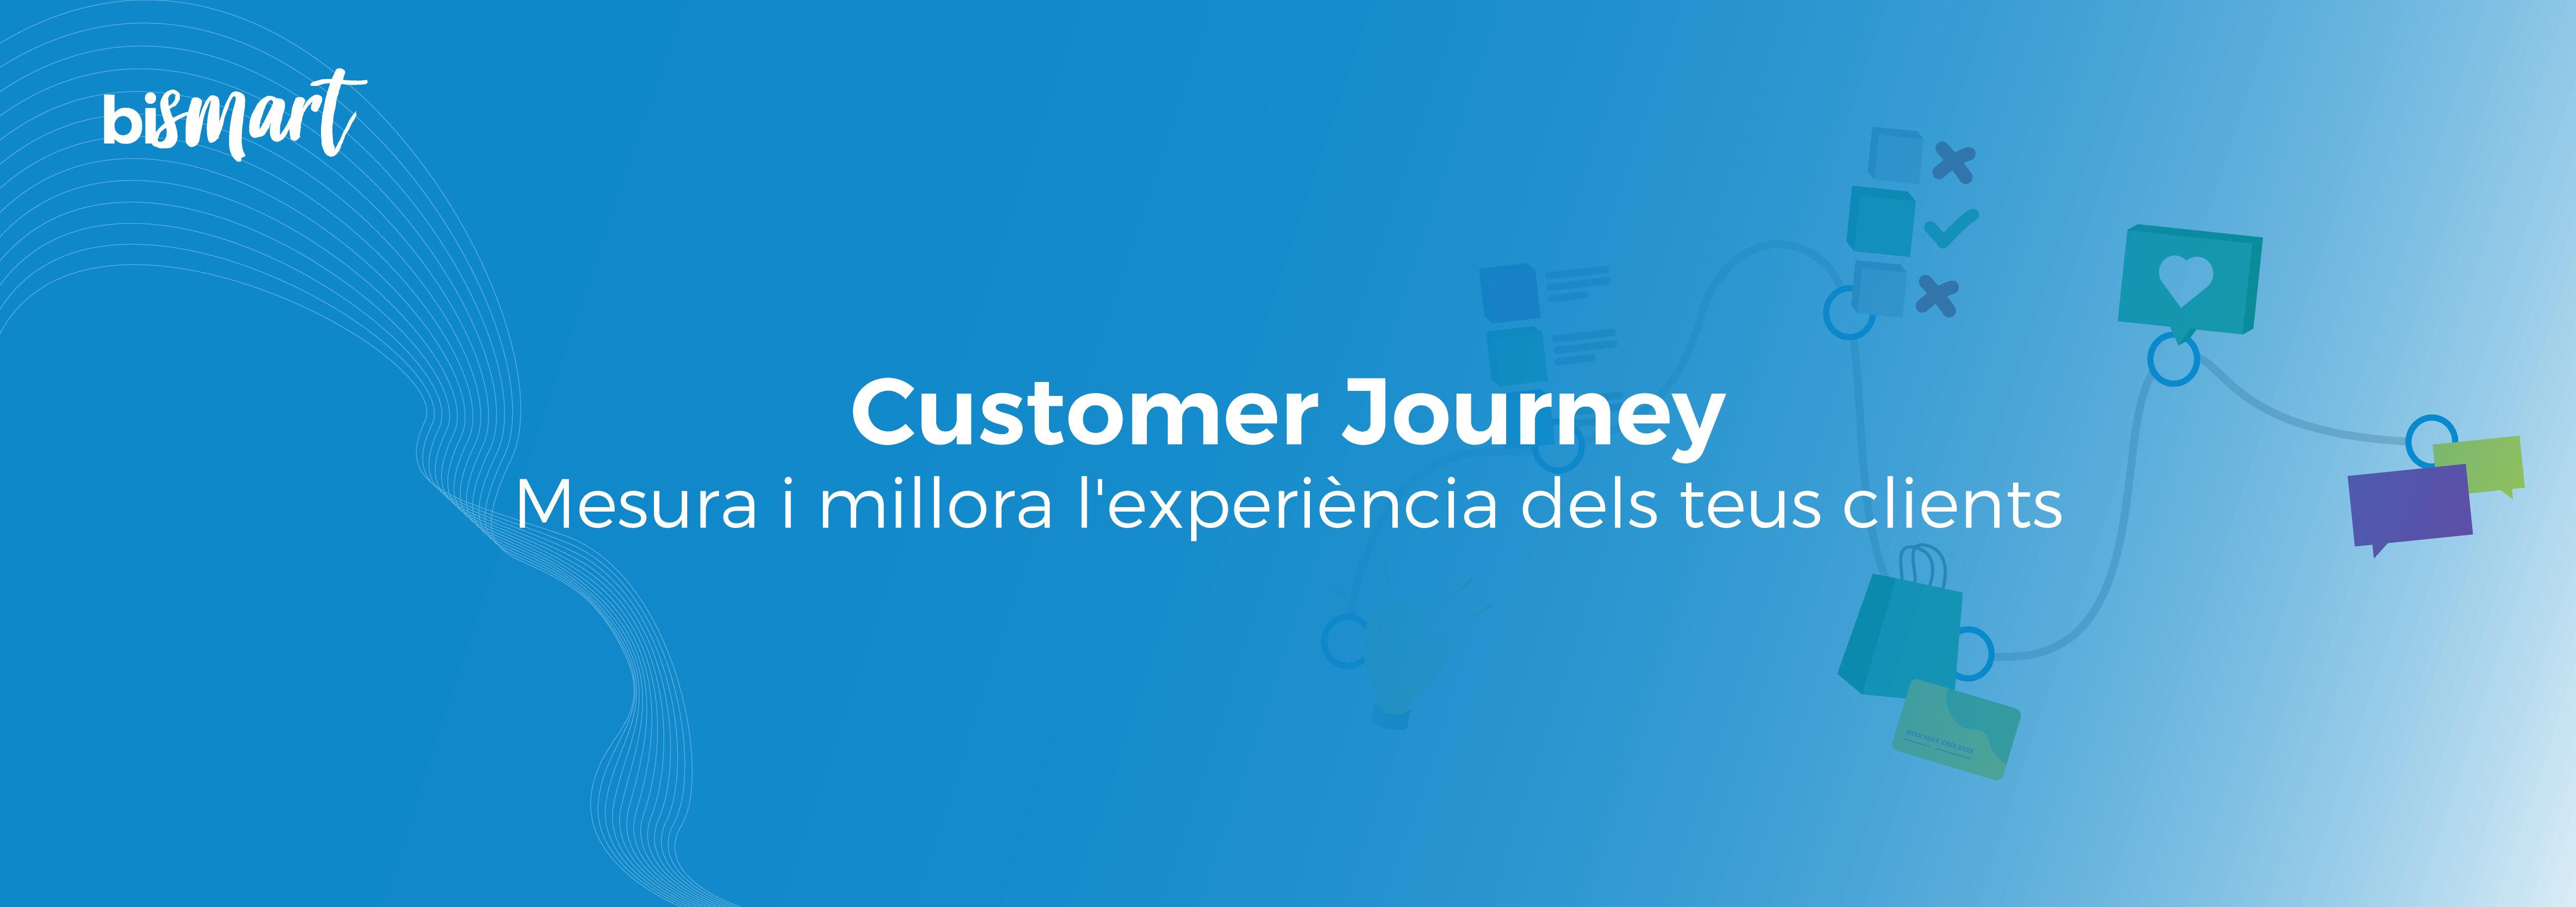 Customer-Journey-Landing-CA-01